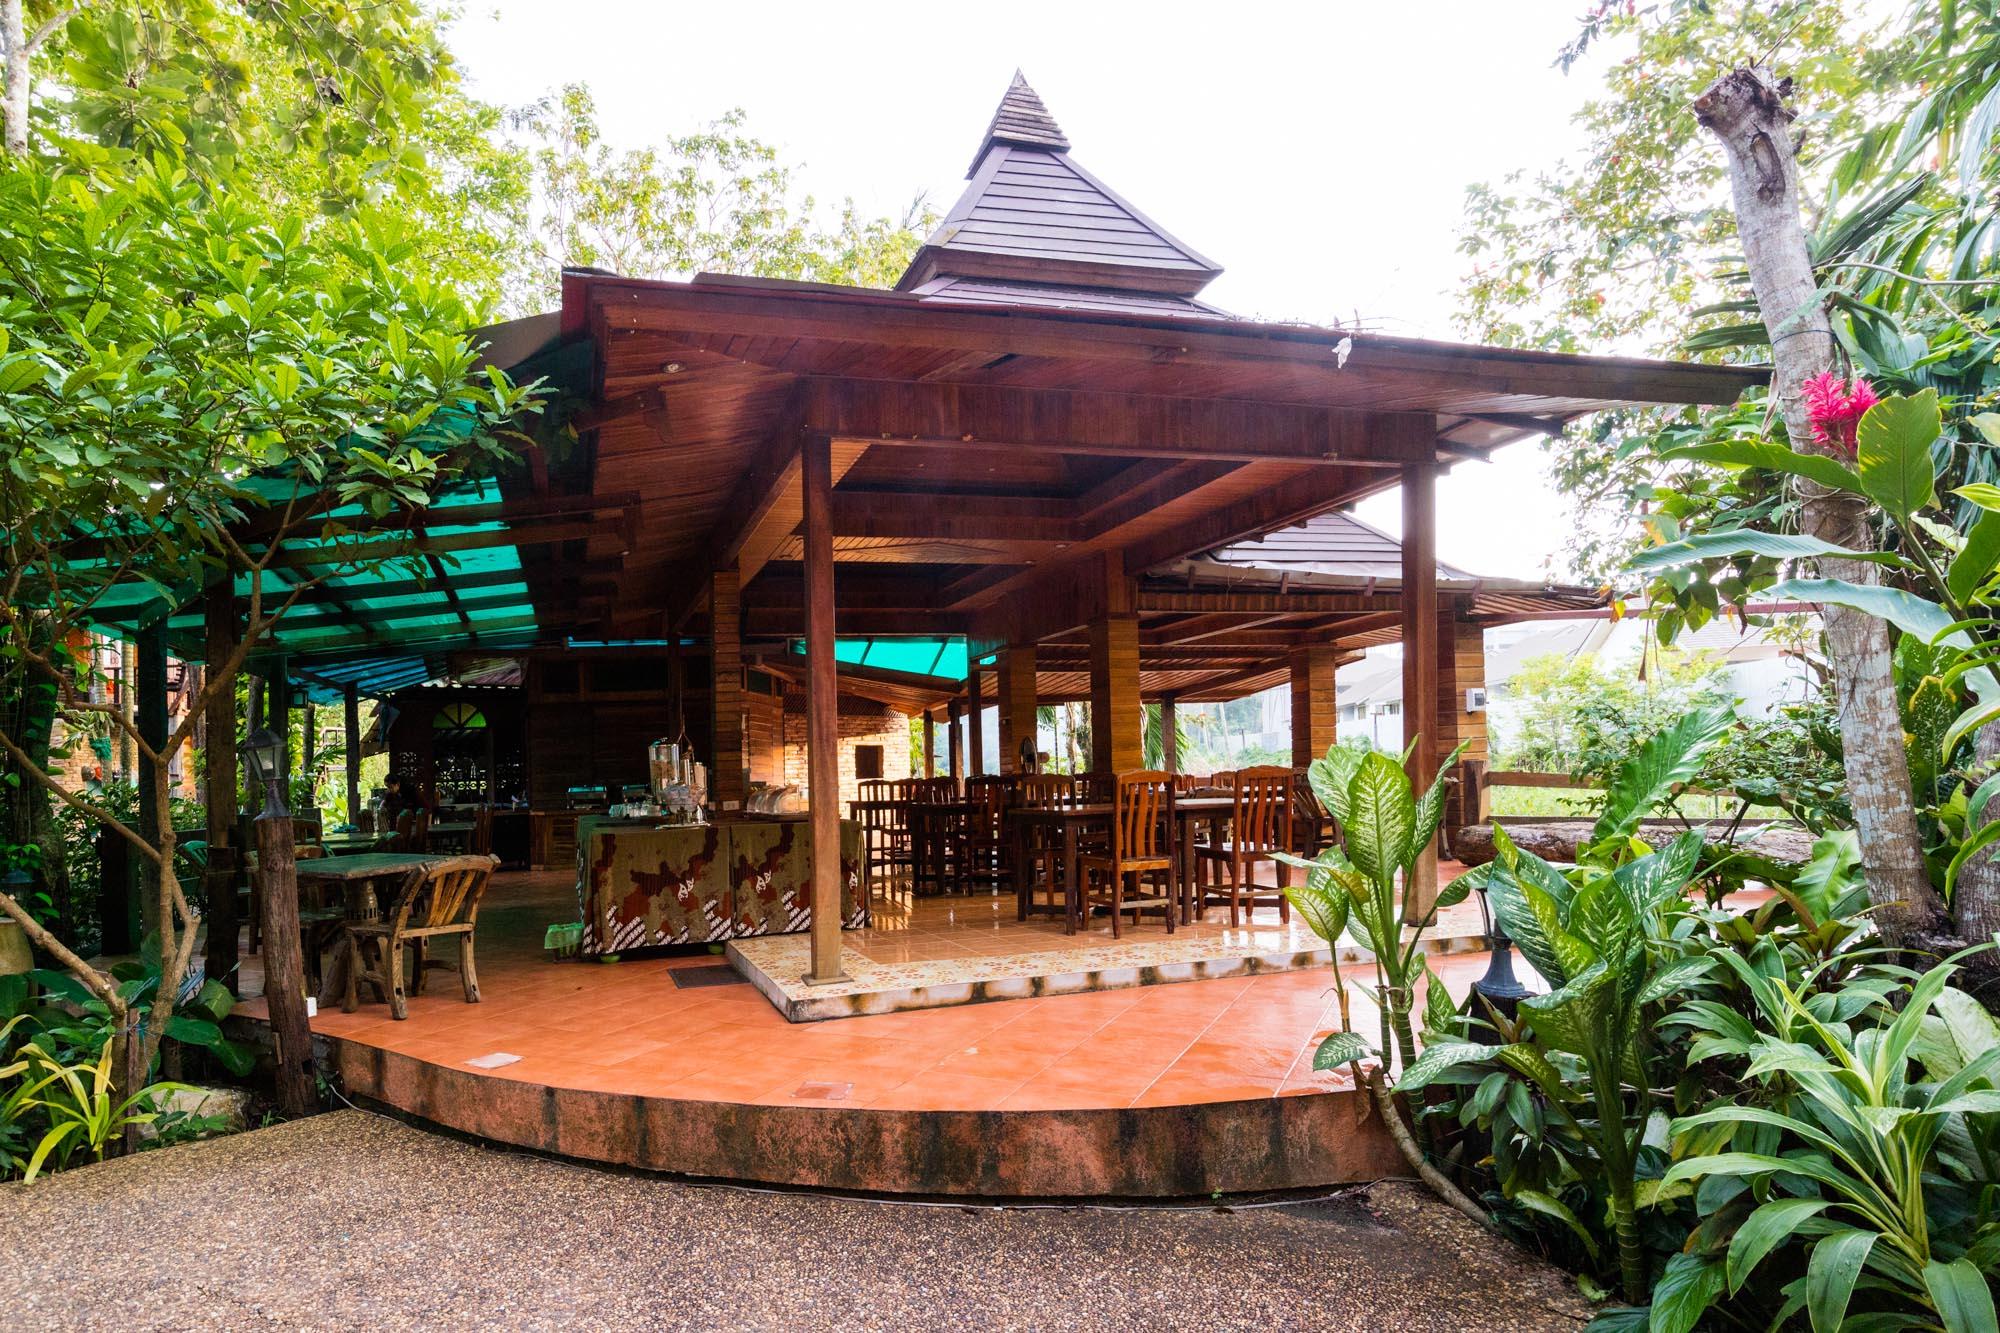 Phupha Ao Nang Resort & Spa in Ao Nang Beach, Krabi, Thailand  Phu Pha Aonang Resort & Spa ภูผา อ่าวนาง รีสอร์ทแอนด์สปา IMG 5770